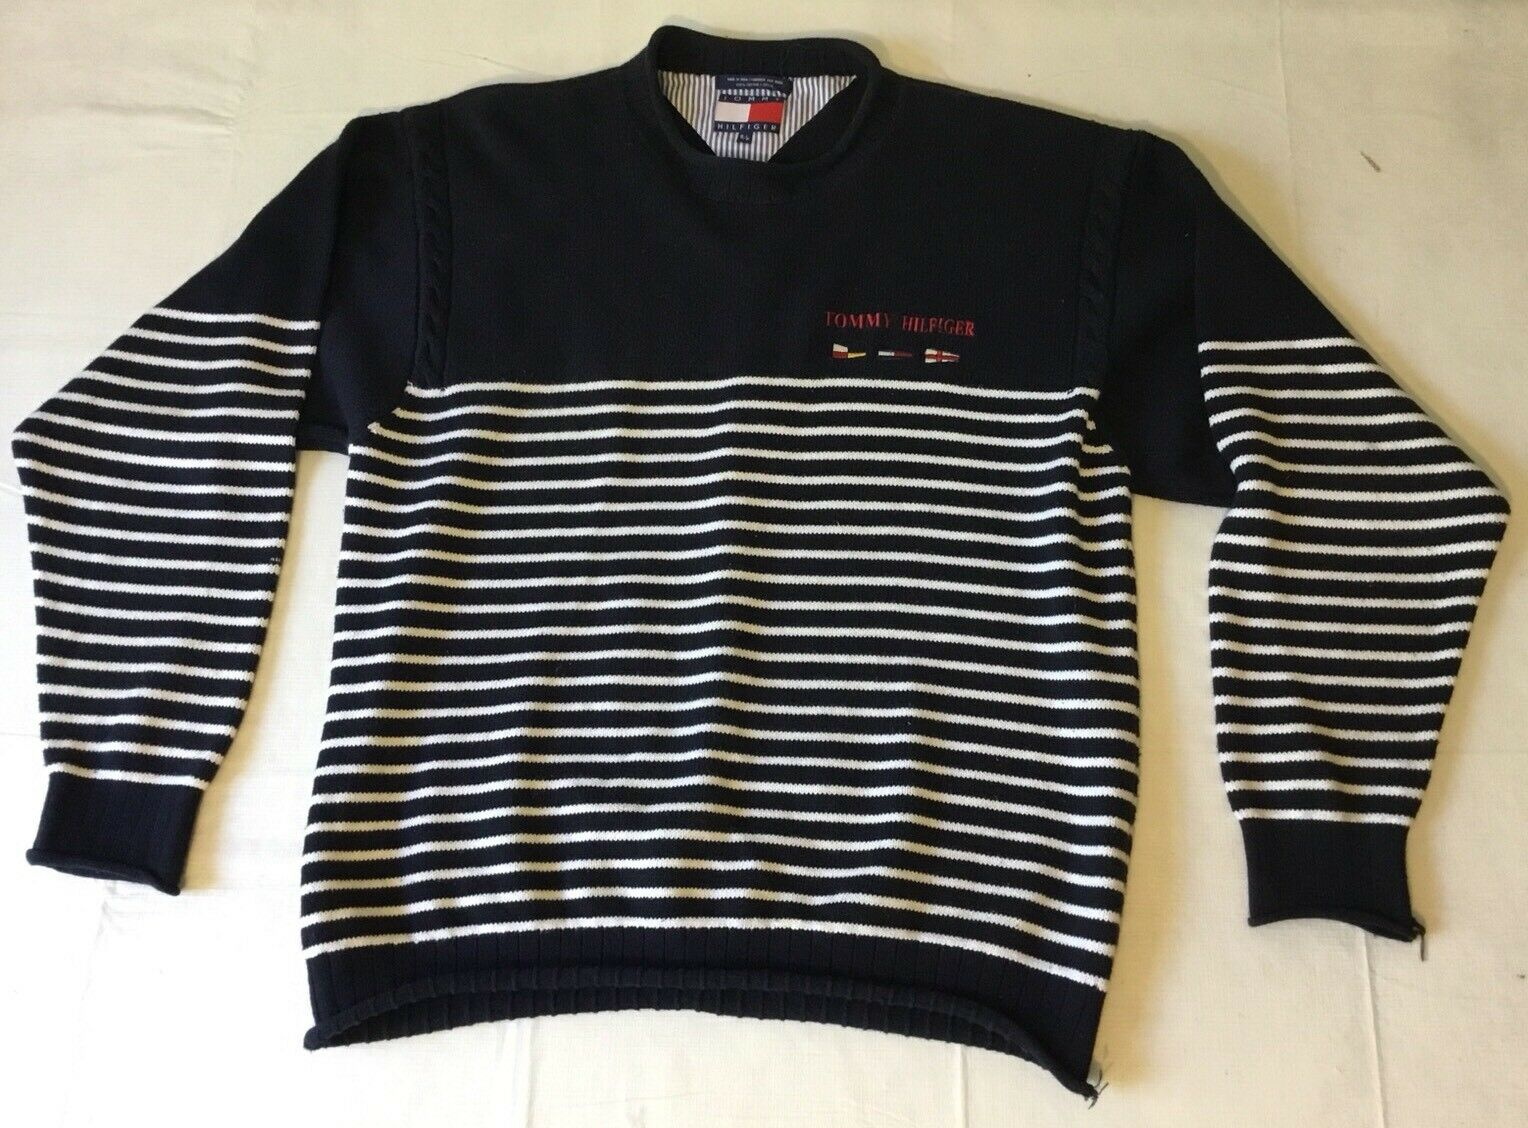 Vintage 90s Tommy Hilfiger Sailing Boat Flag Knit Sweater Striped Blau Weiß S